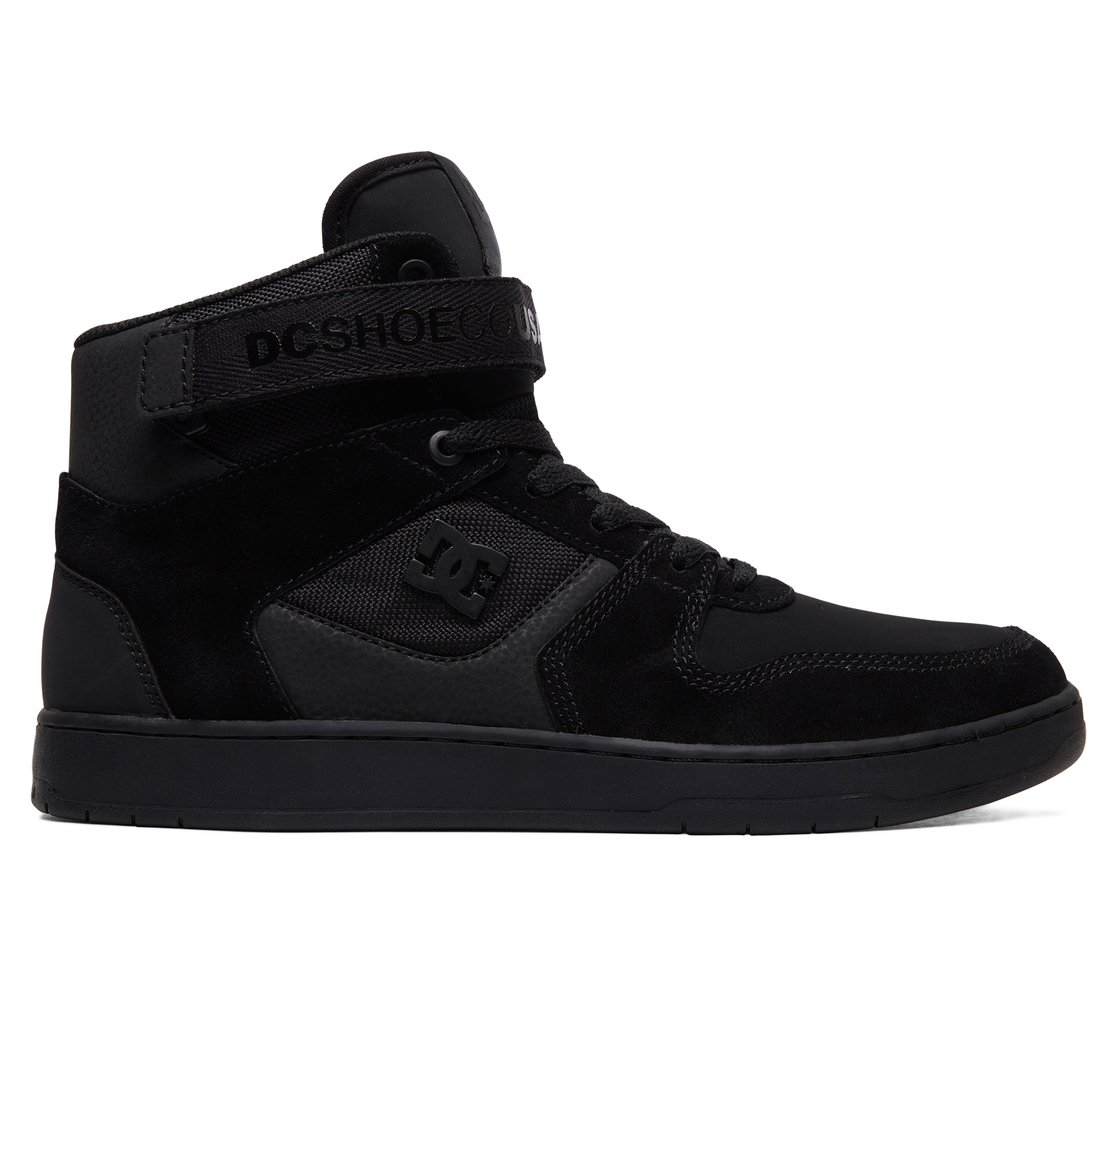 0 Pensford High-Top Shoes Black ADYS400038 DC Shoes 50fb3a626d18